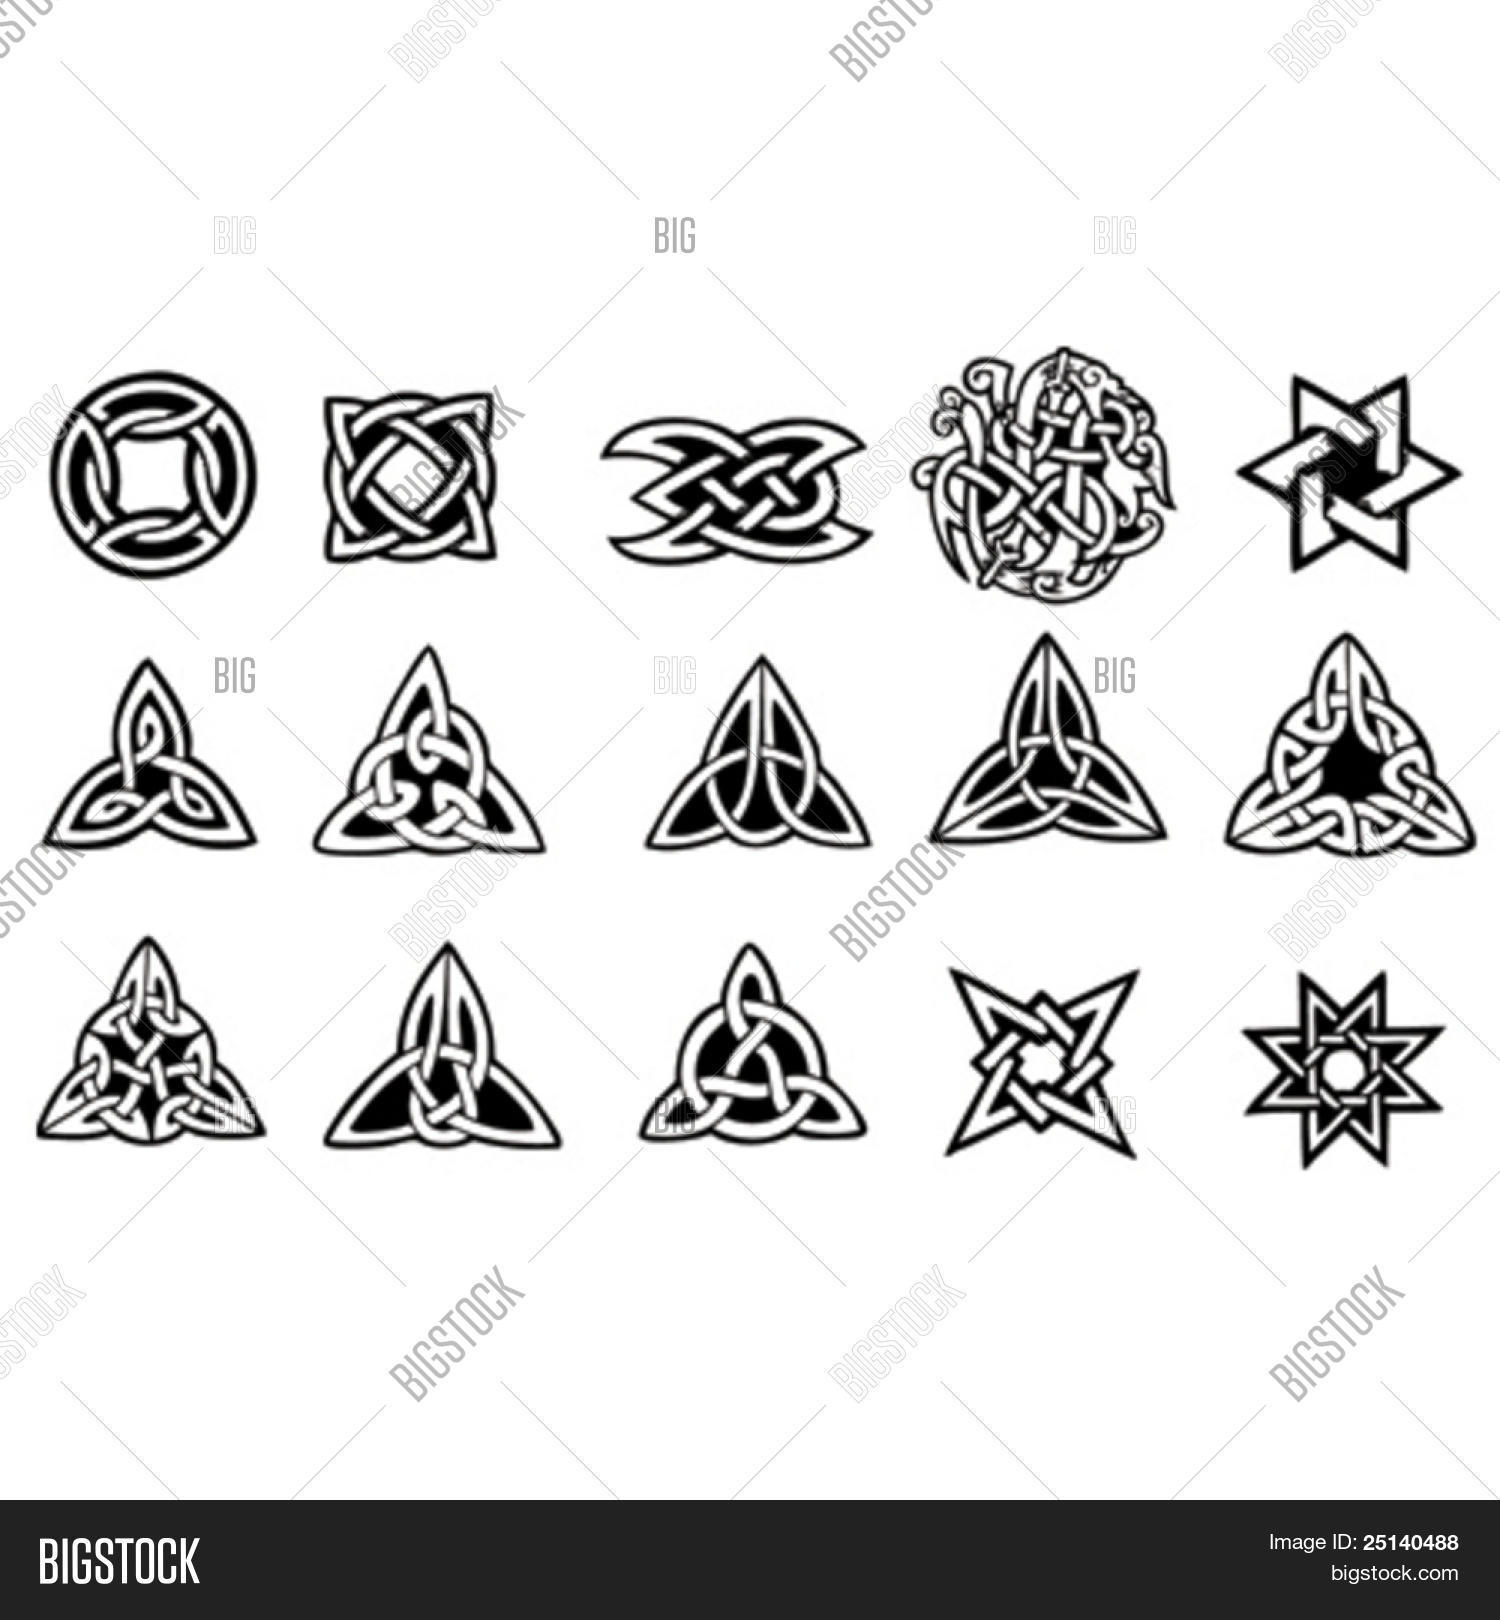 celtic symbols vector photo free trial bigstock